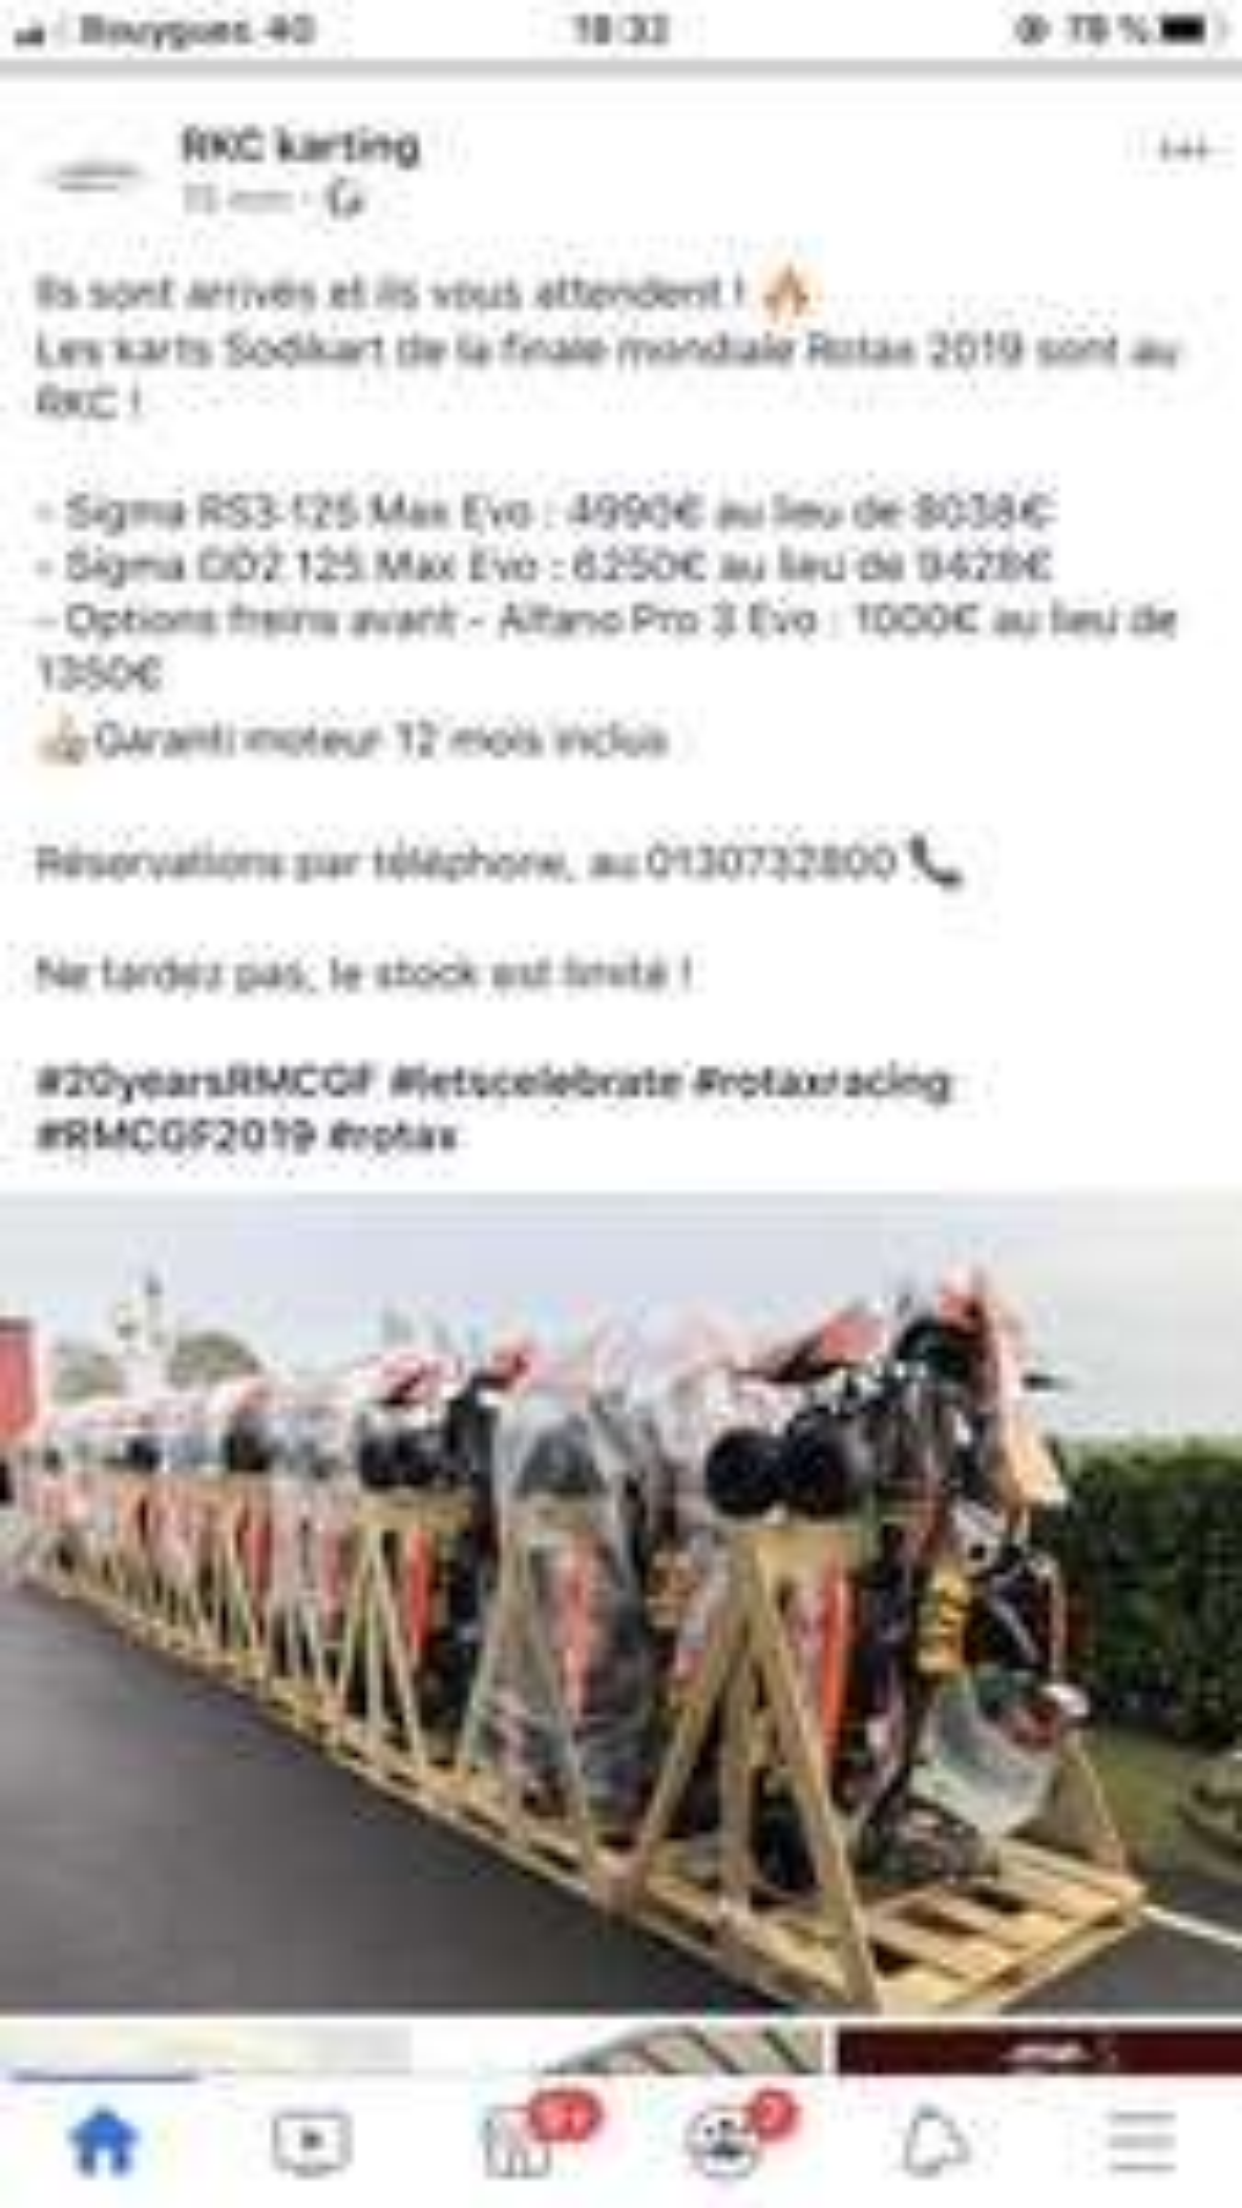 Karting Sigma RS3 125 Max Evo Rotax (2019) - RKC Karting Boissy-l'Aillerie (95)